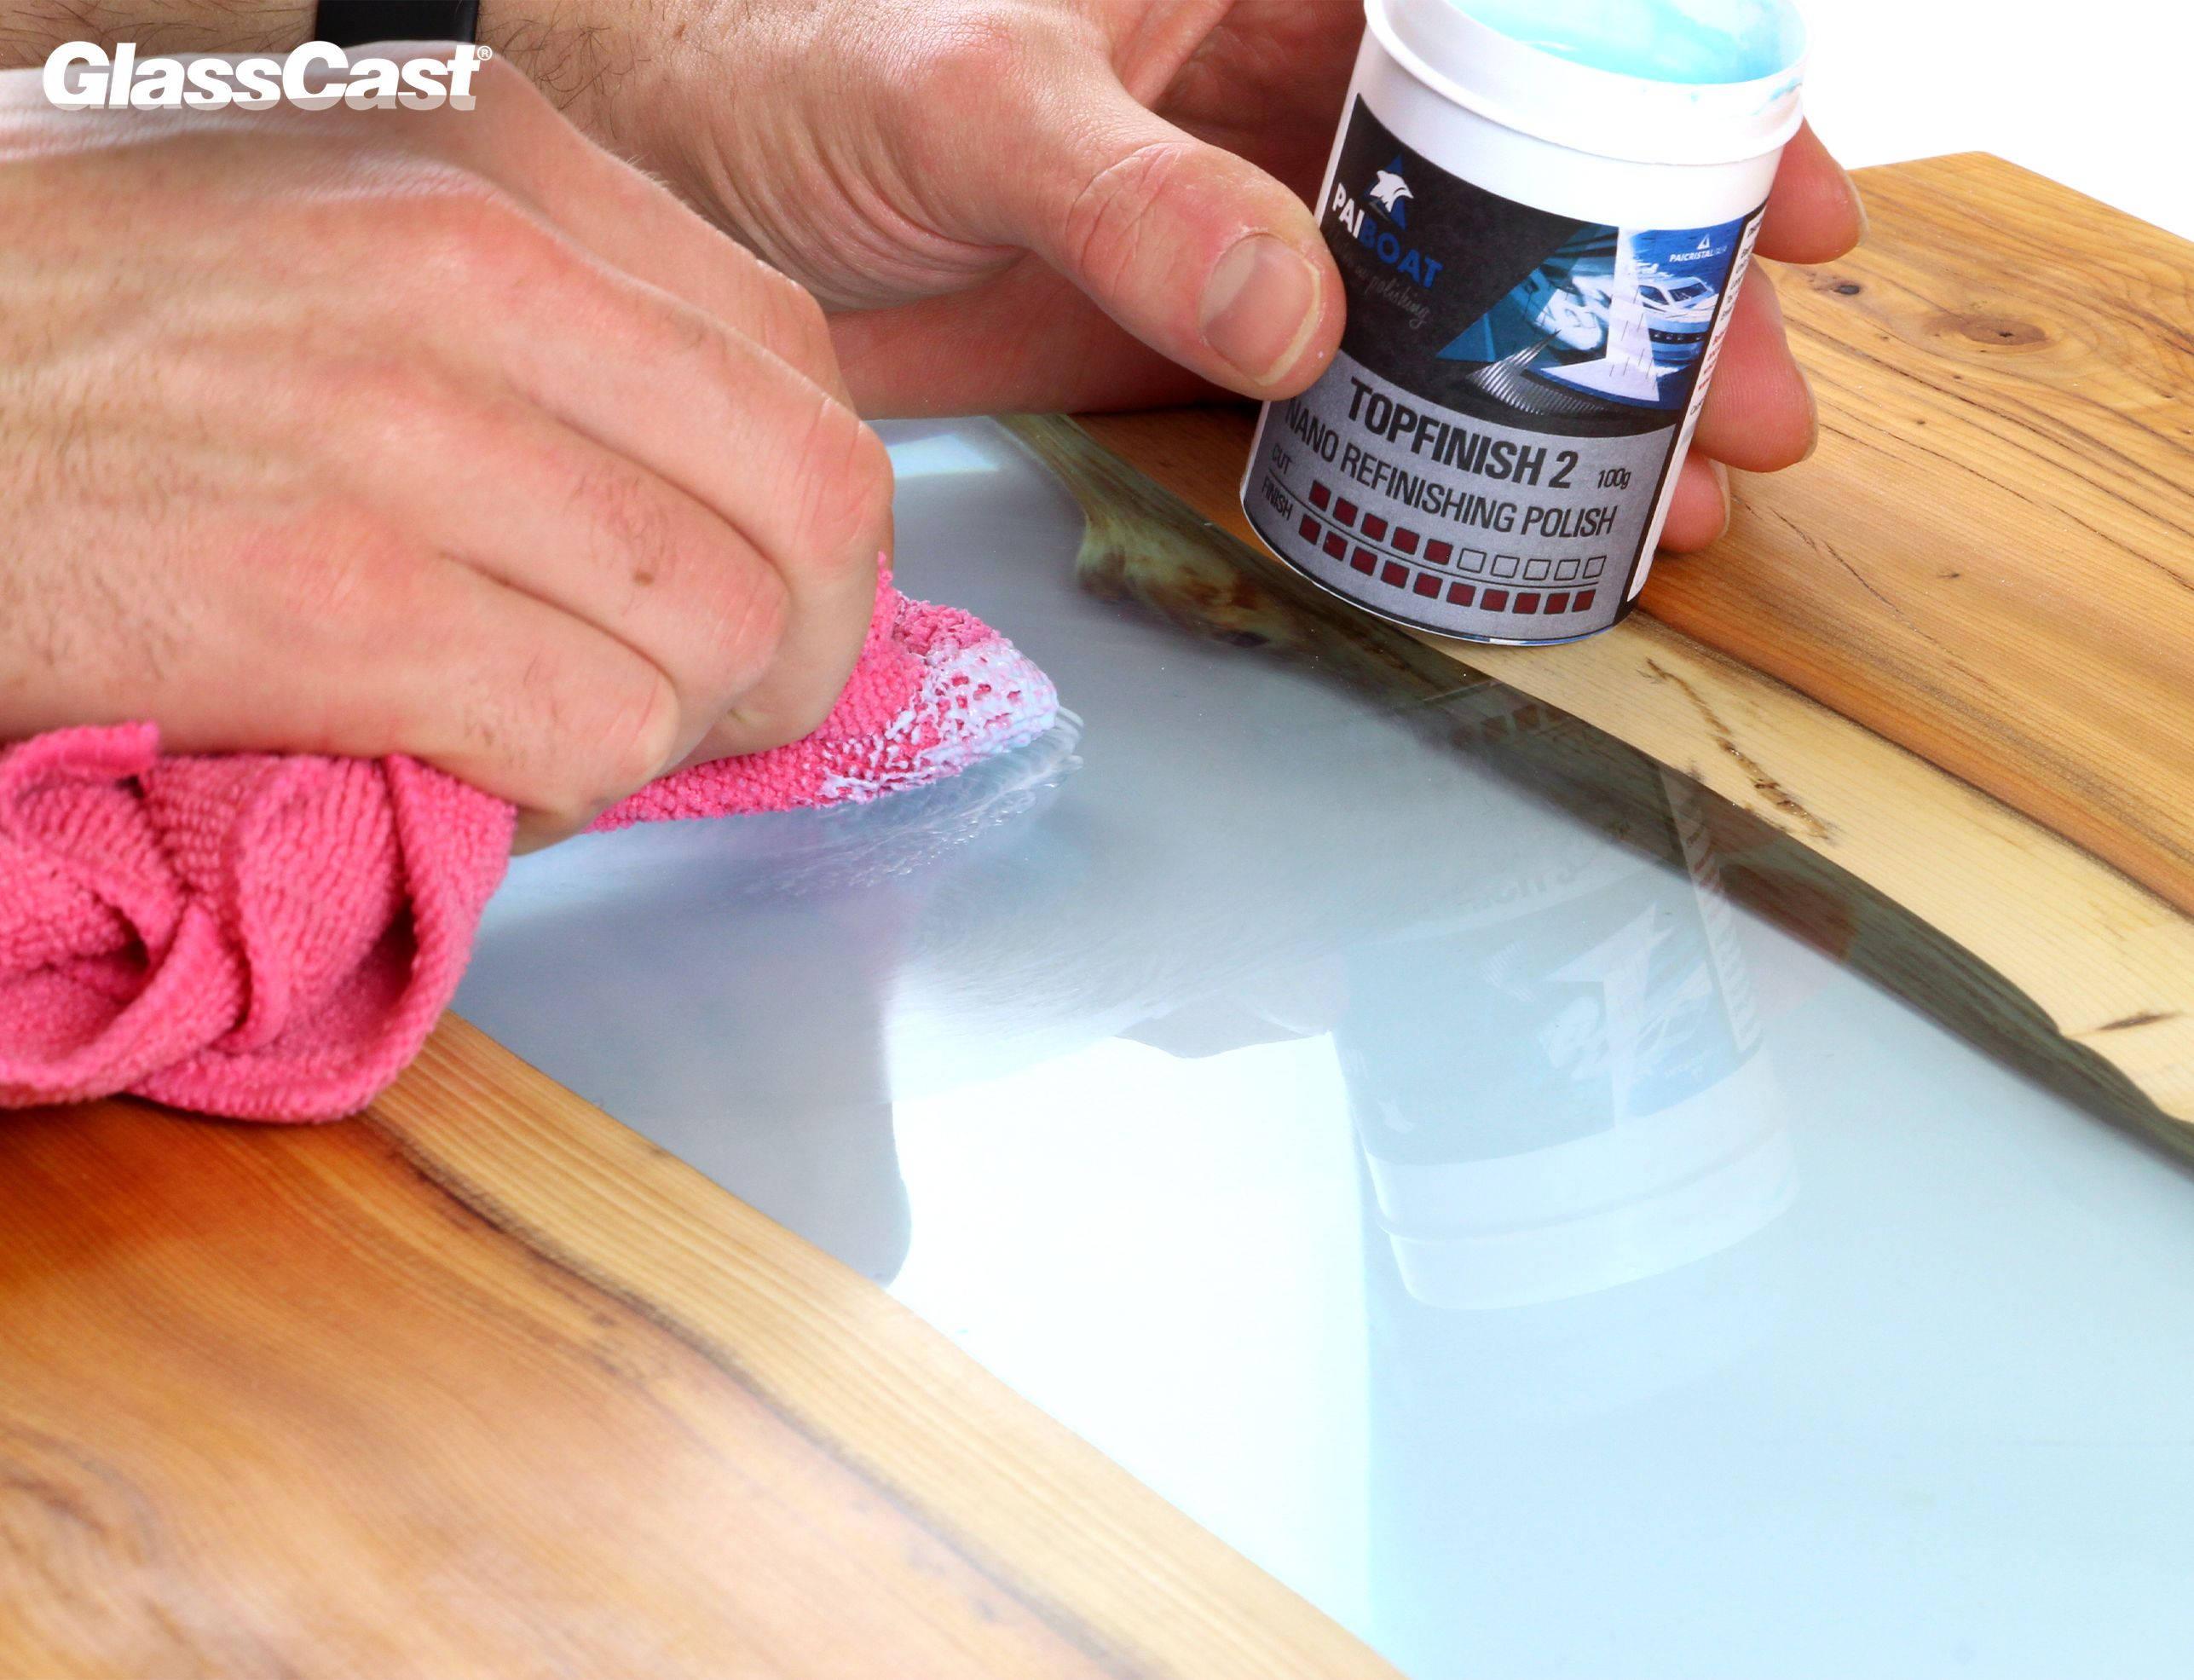 TOPFINISH 2 Ultra High Gloss Polishing Compound for Epoxy